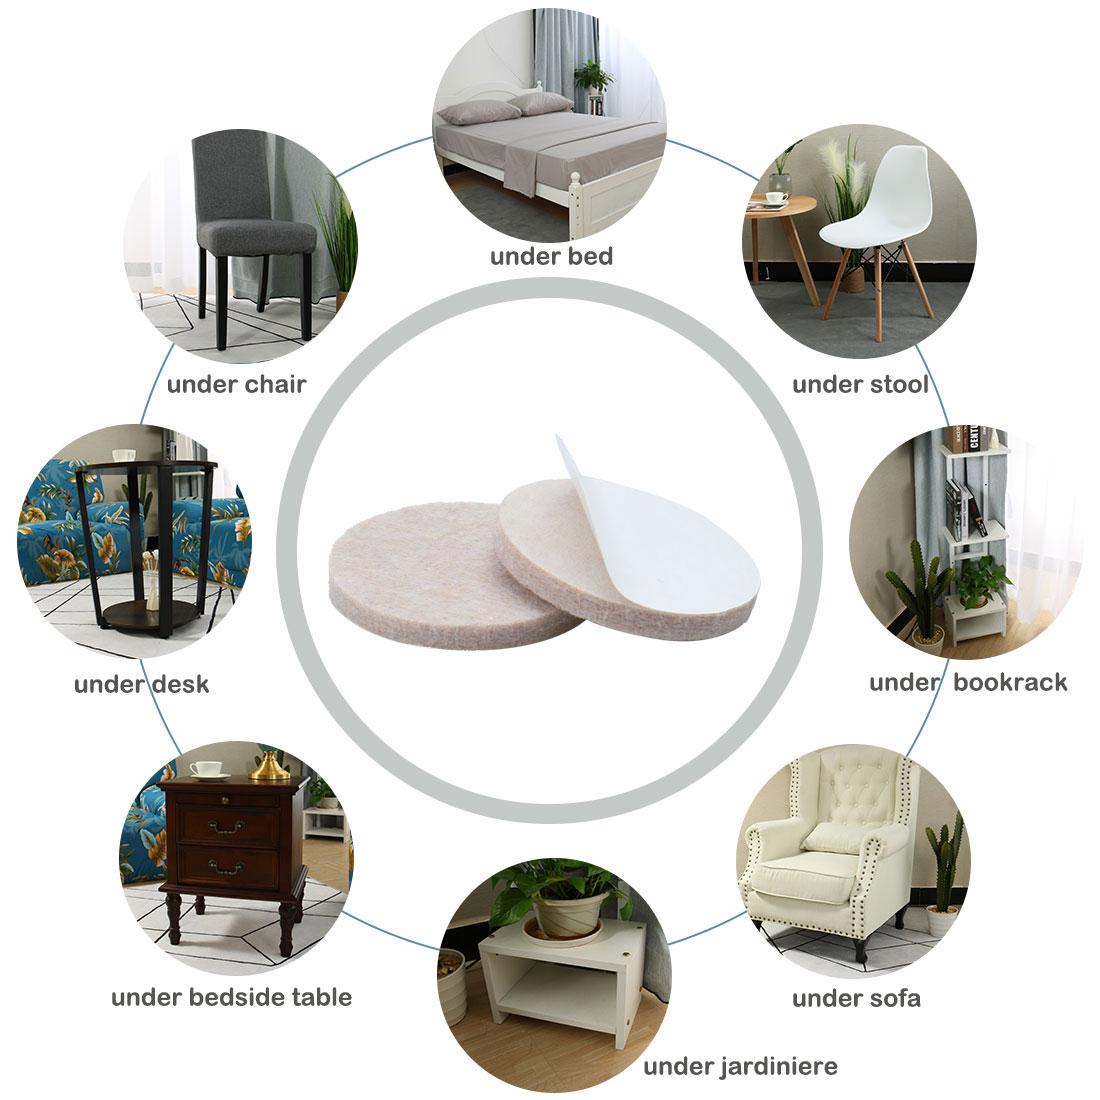 "Felt Furniture Pad Round 1 3/4"" Self Adhesive Anti-scratch Chair Protector 30pcs - image 4 de 7"